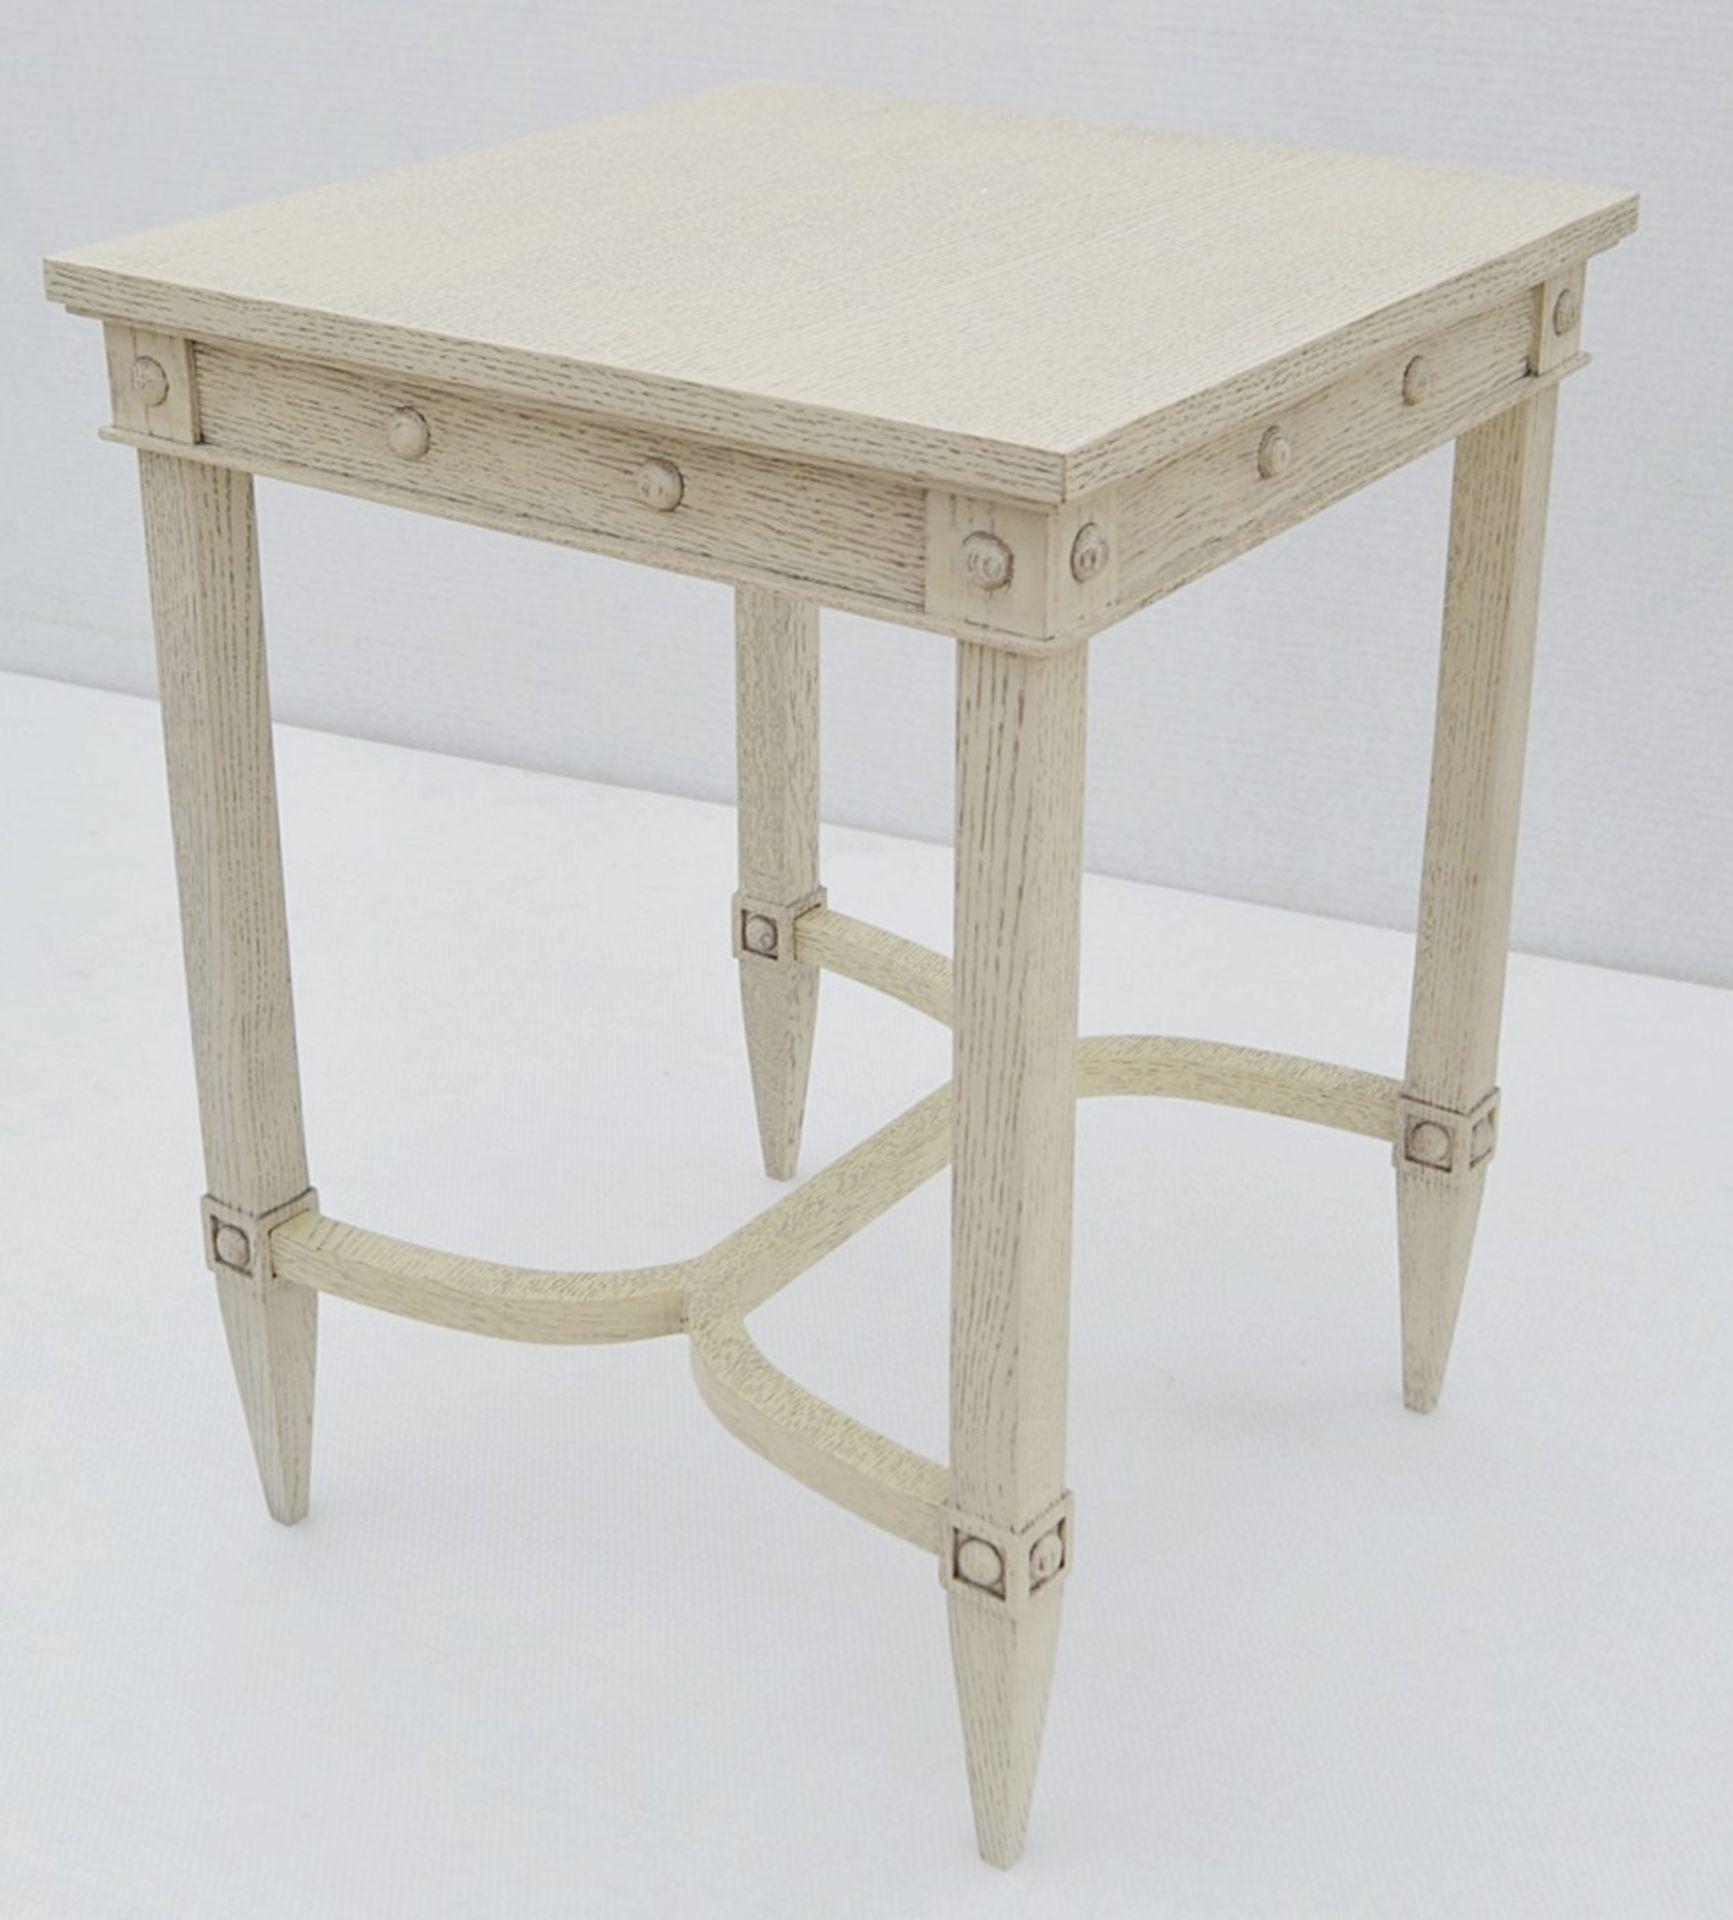 1 x JUSTIN VAN BREDA 'Thomas' Designer Georgian-inspired Table In Limed Grey Oak - RRP £1,320 - Image 4 of 6